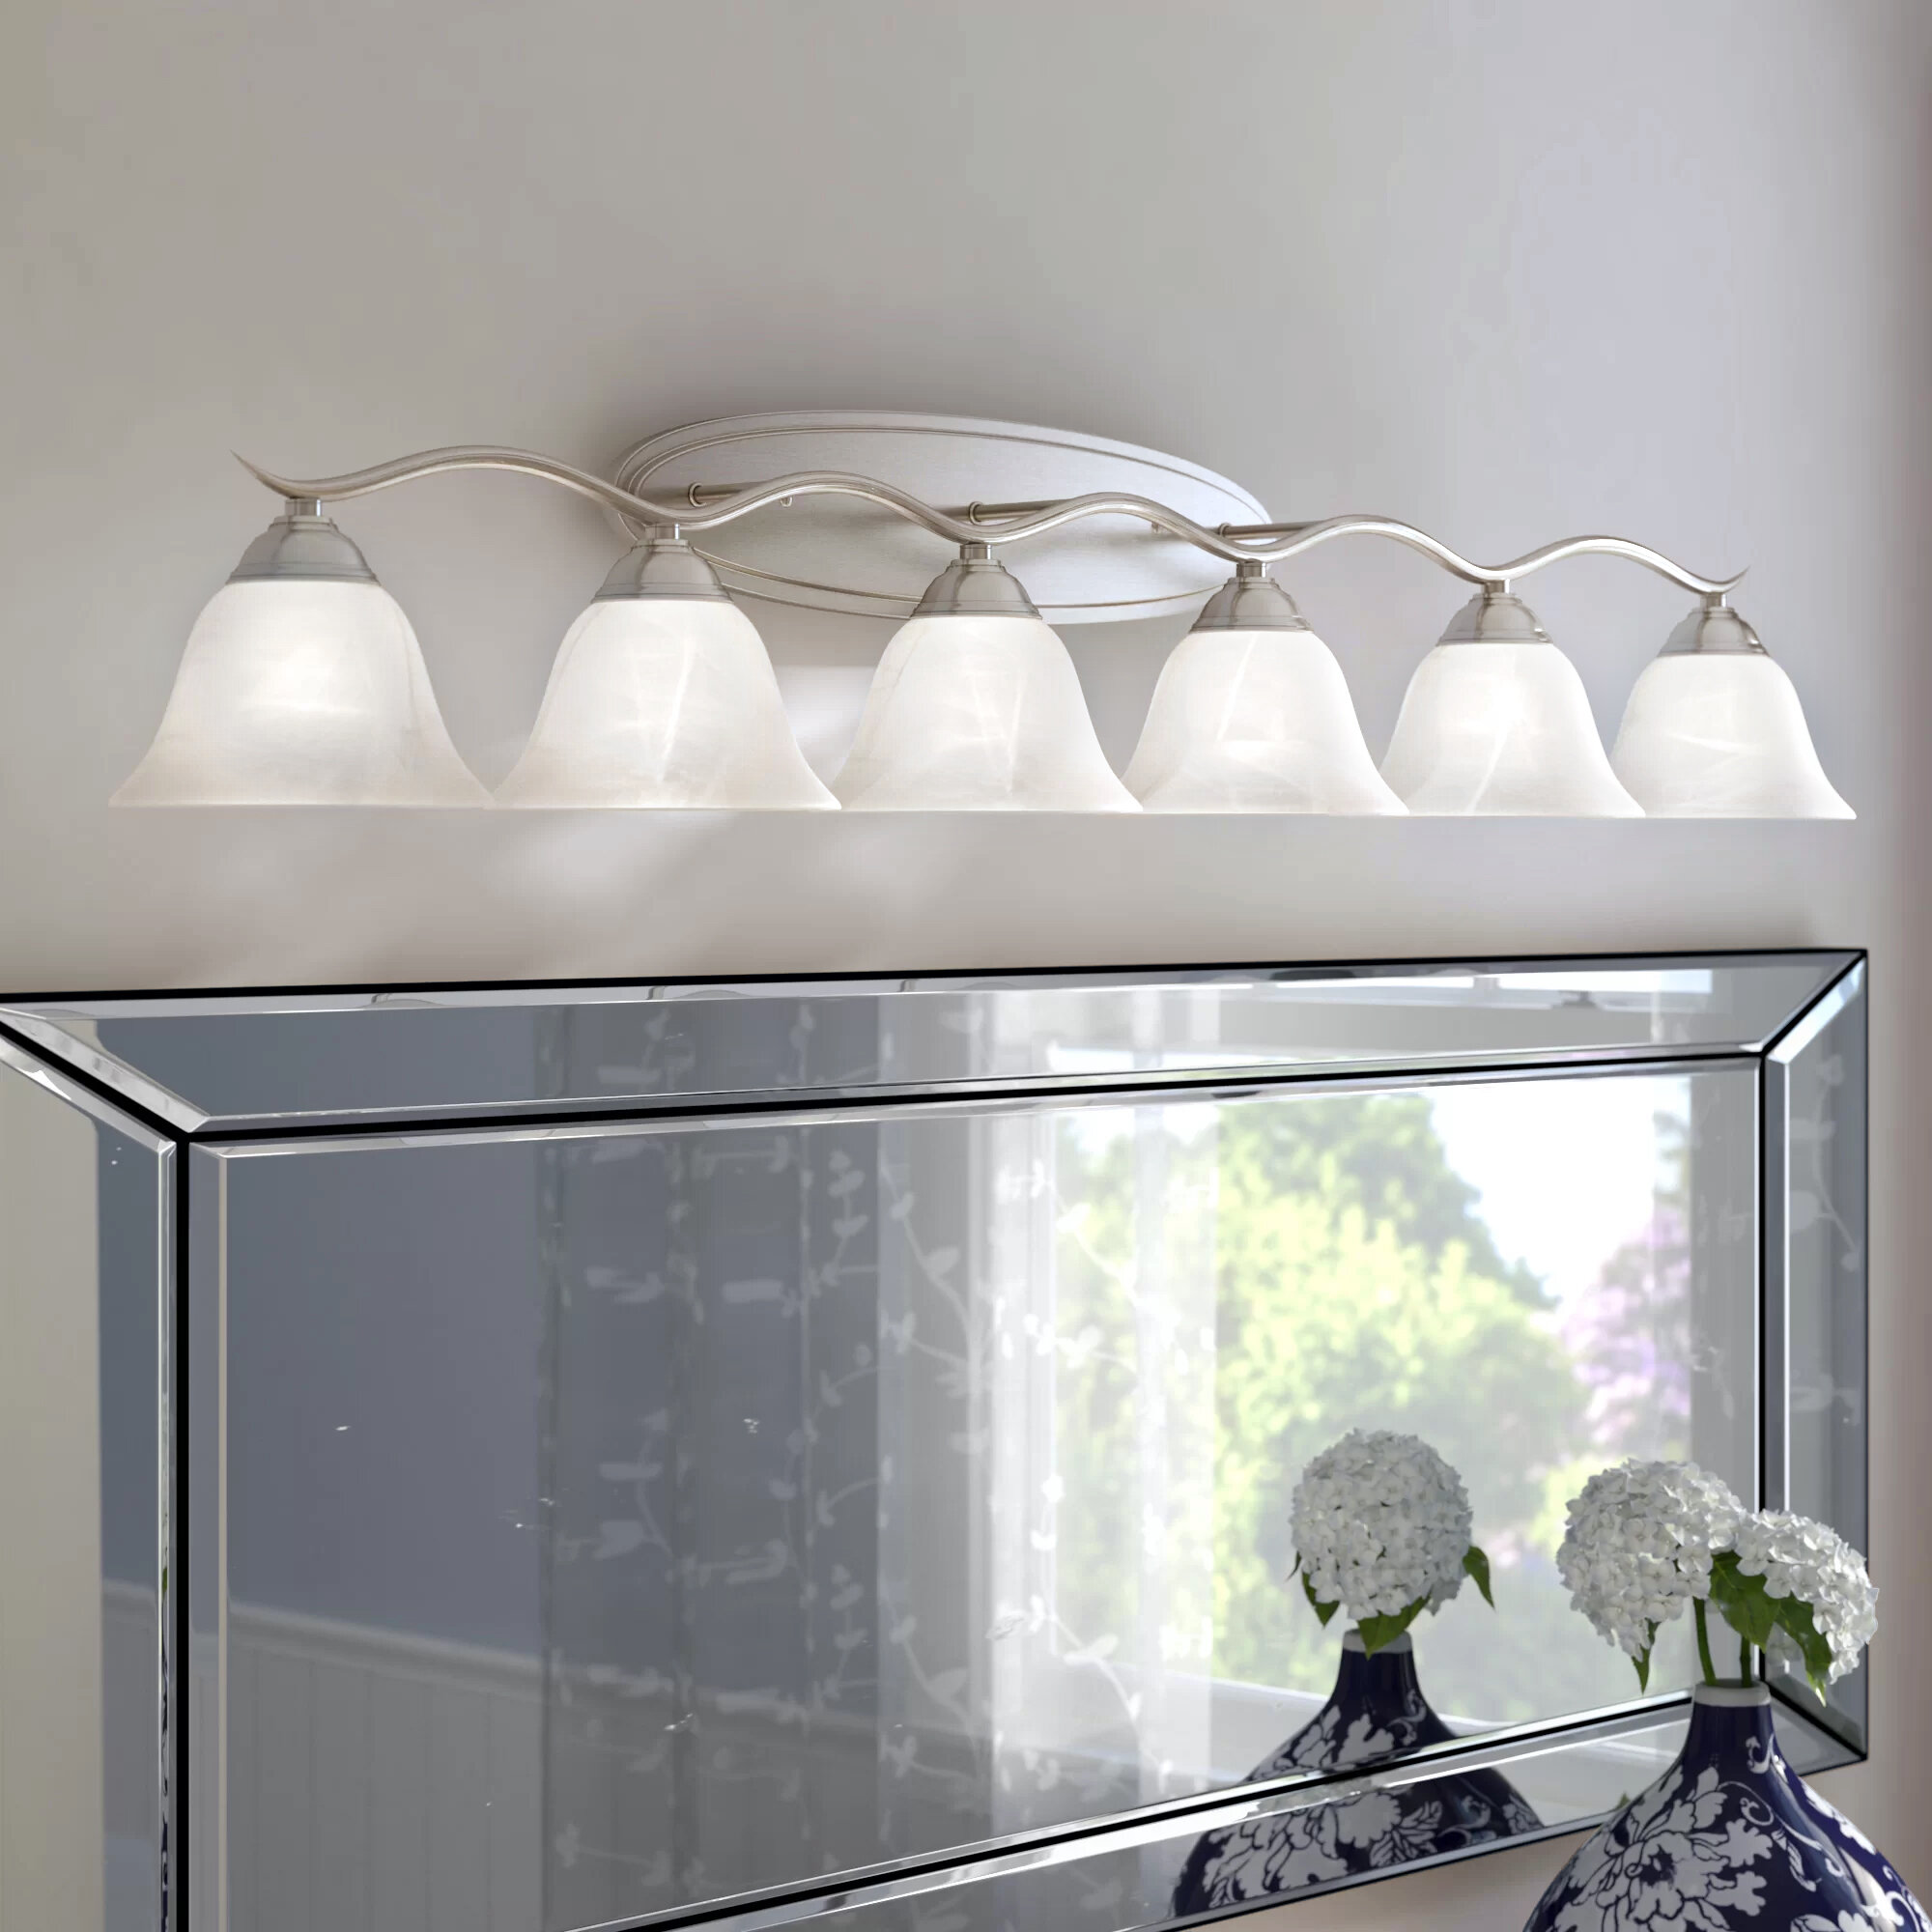 Andover mills corwin 6 light vanity light reviews wayfair aloadofball Gallery